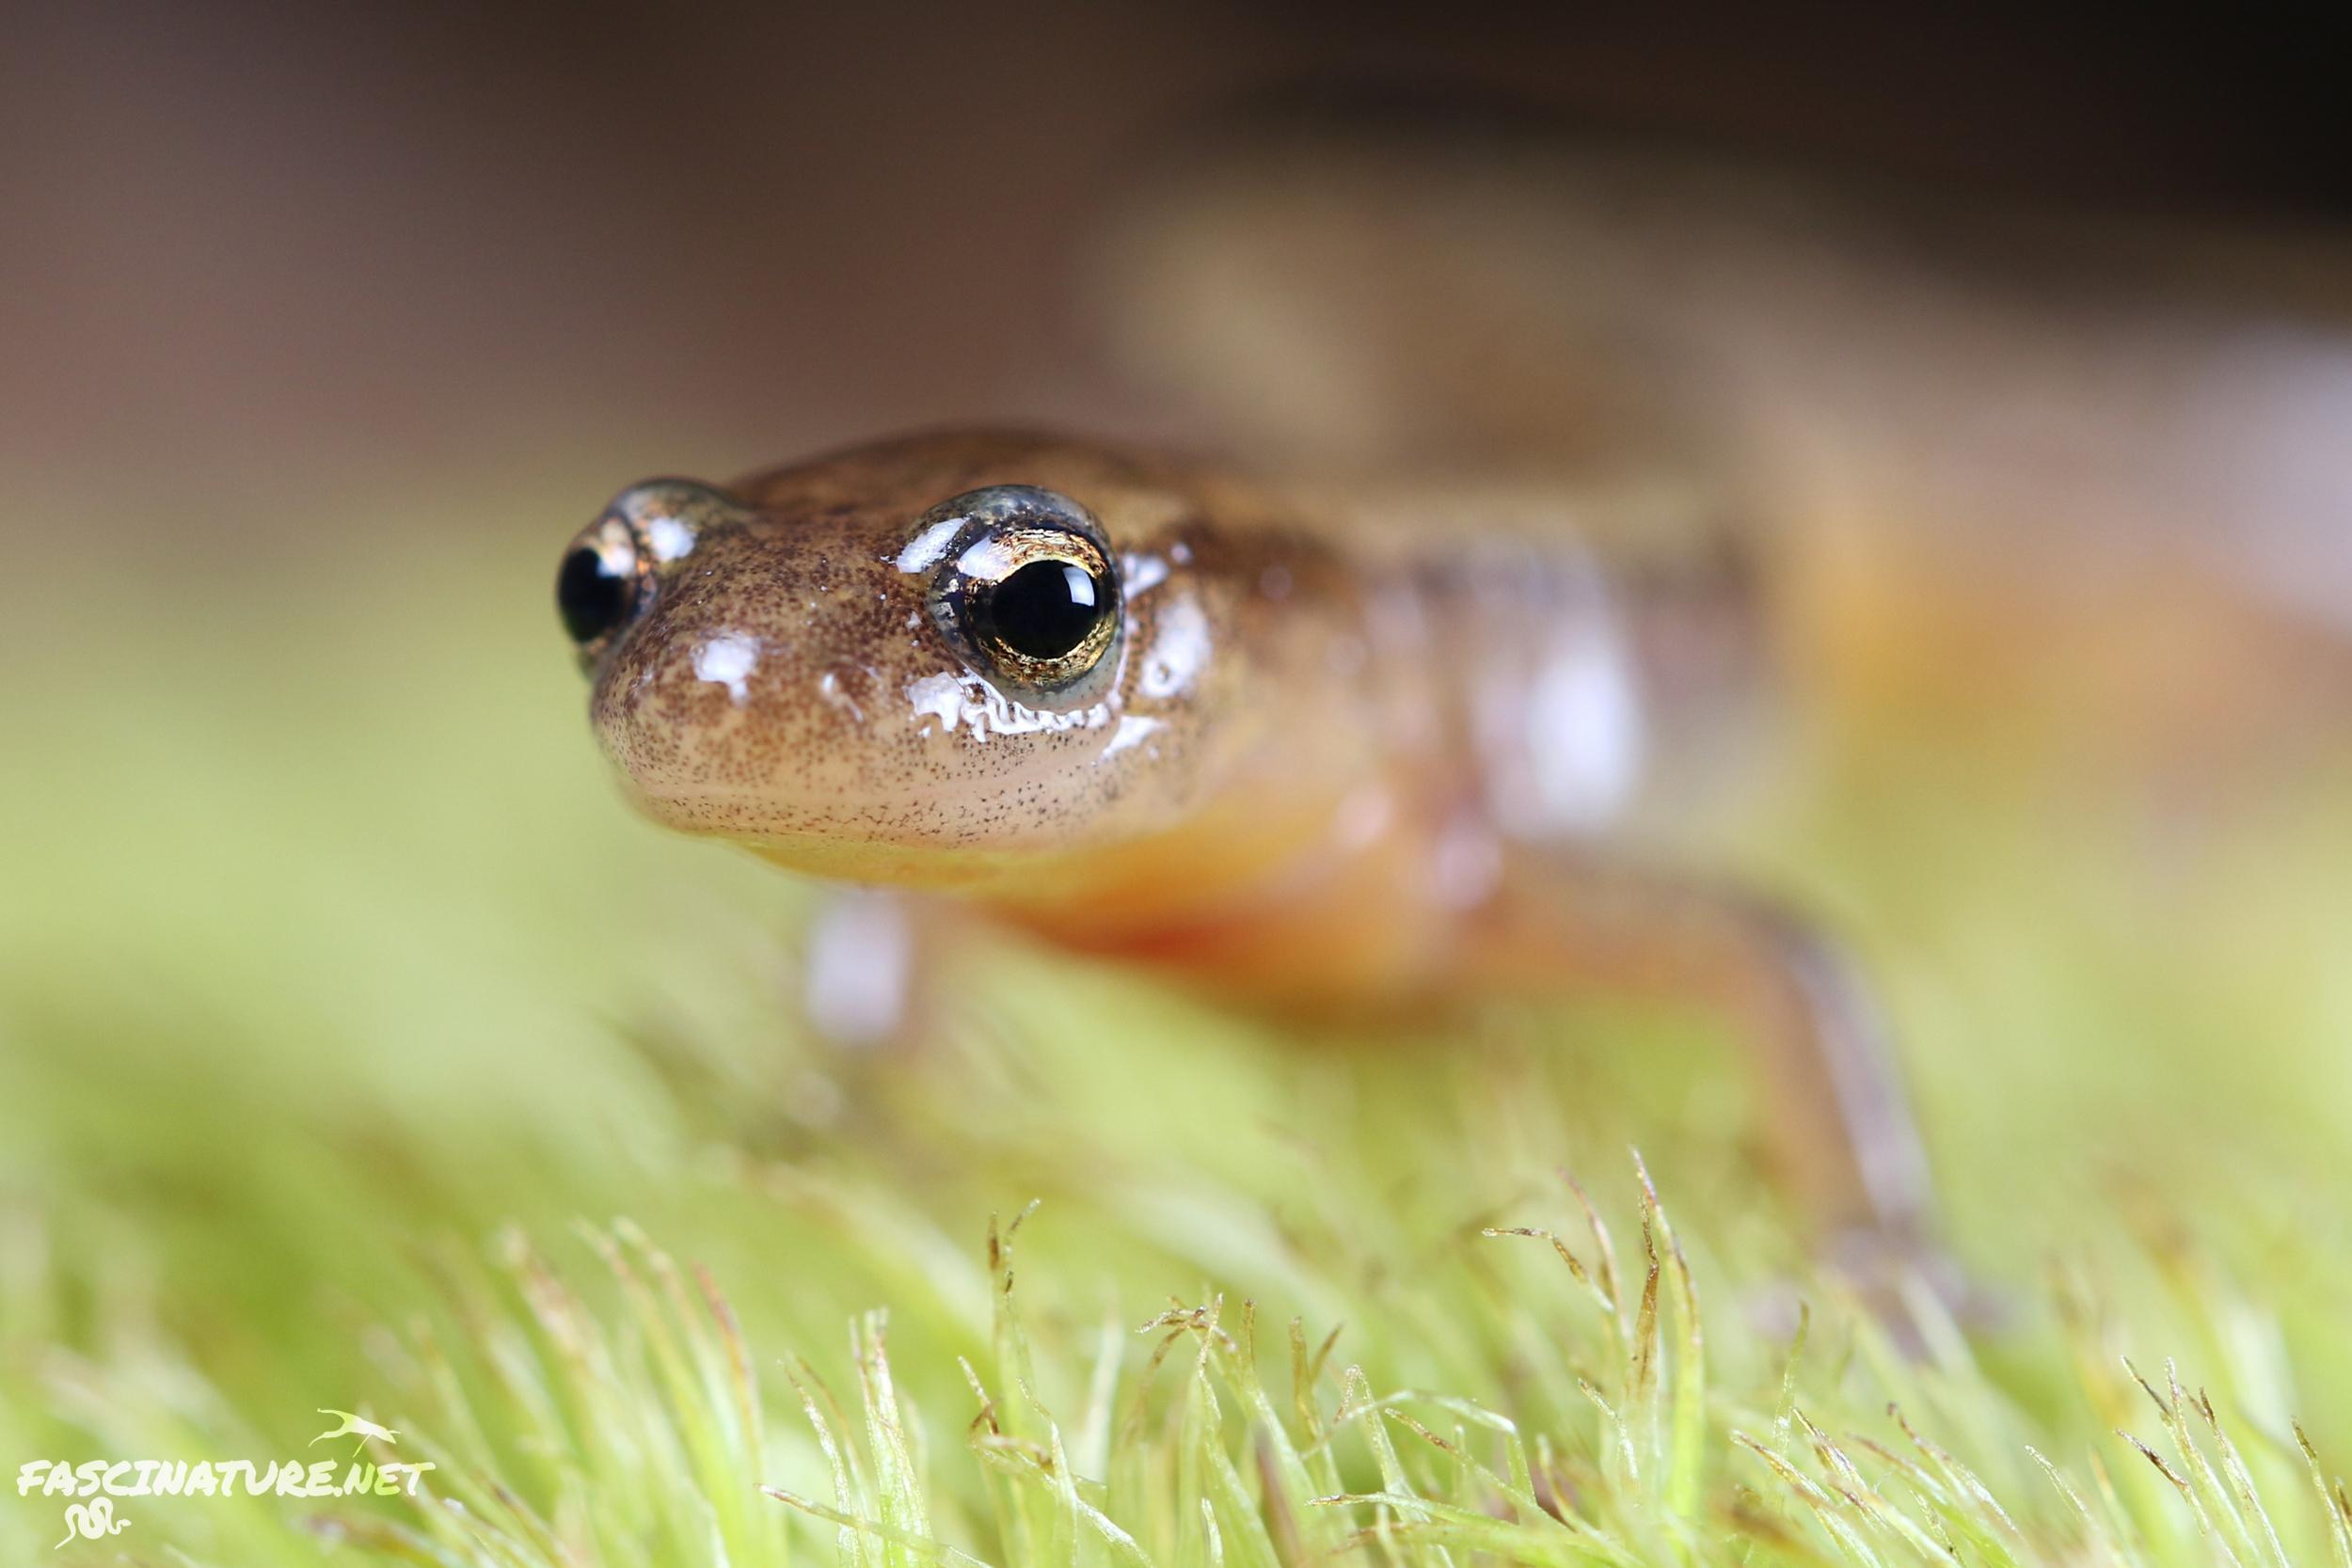 Northern Two-lined Salamander - Lebanon, PA